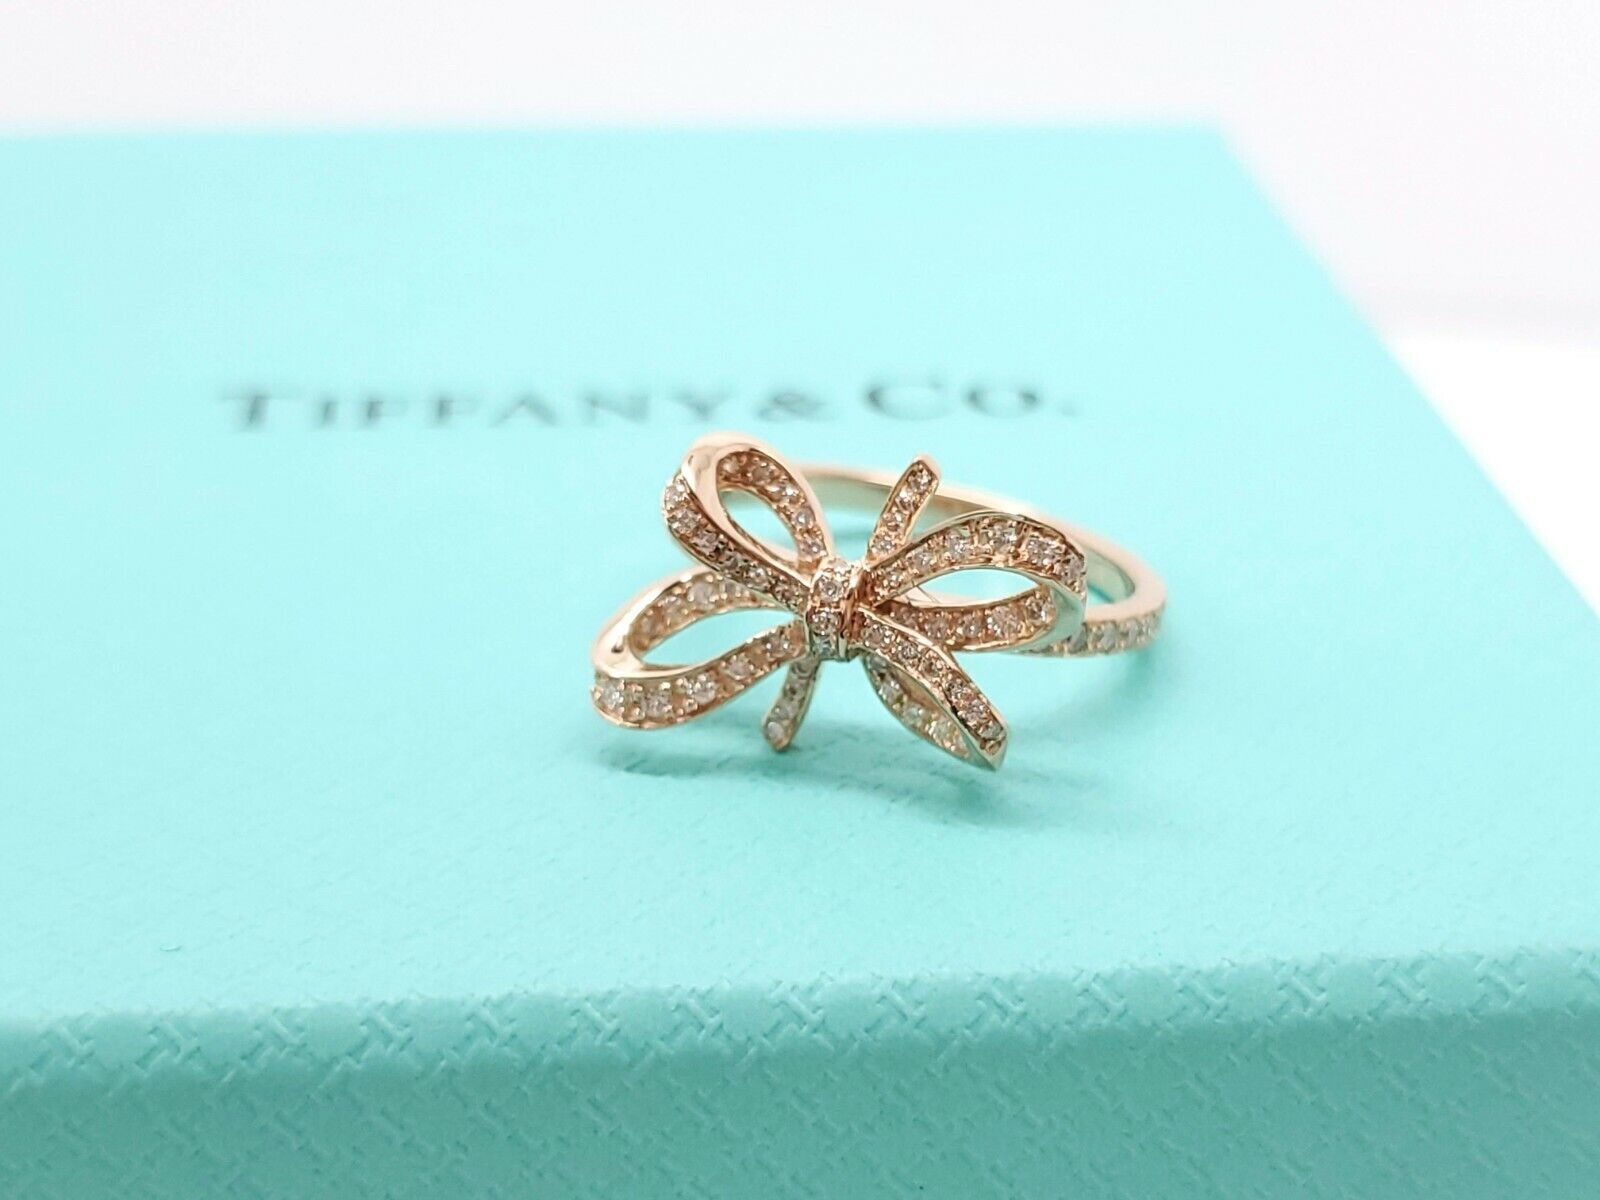 Tiffany & Co Bow Ribbon Rose Pink Gold 750 18k Diamond Ring Size 5.75 AUCTION